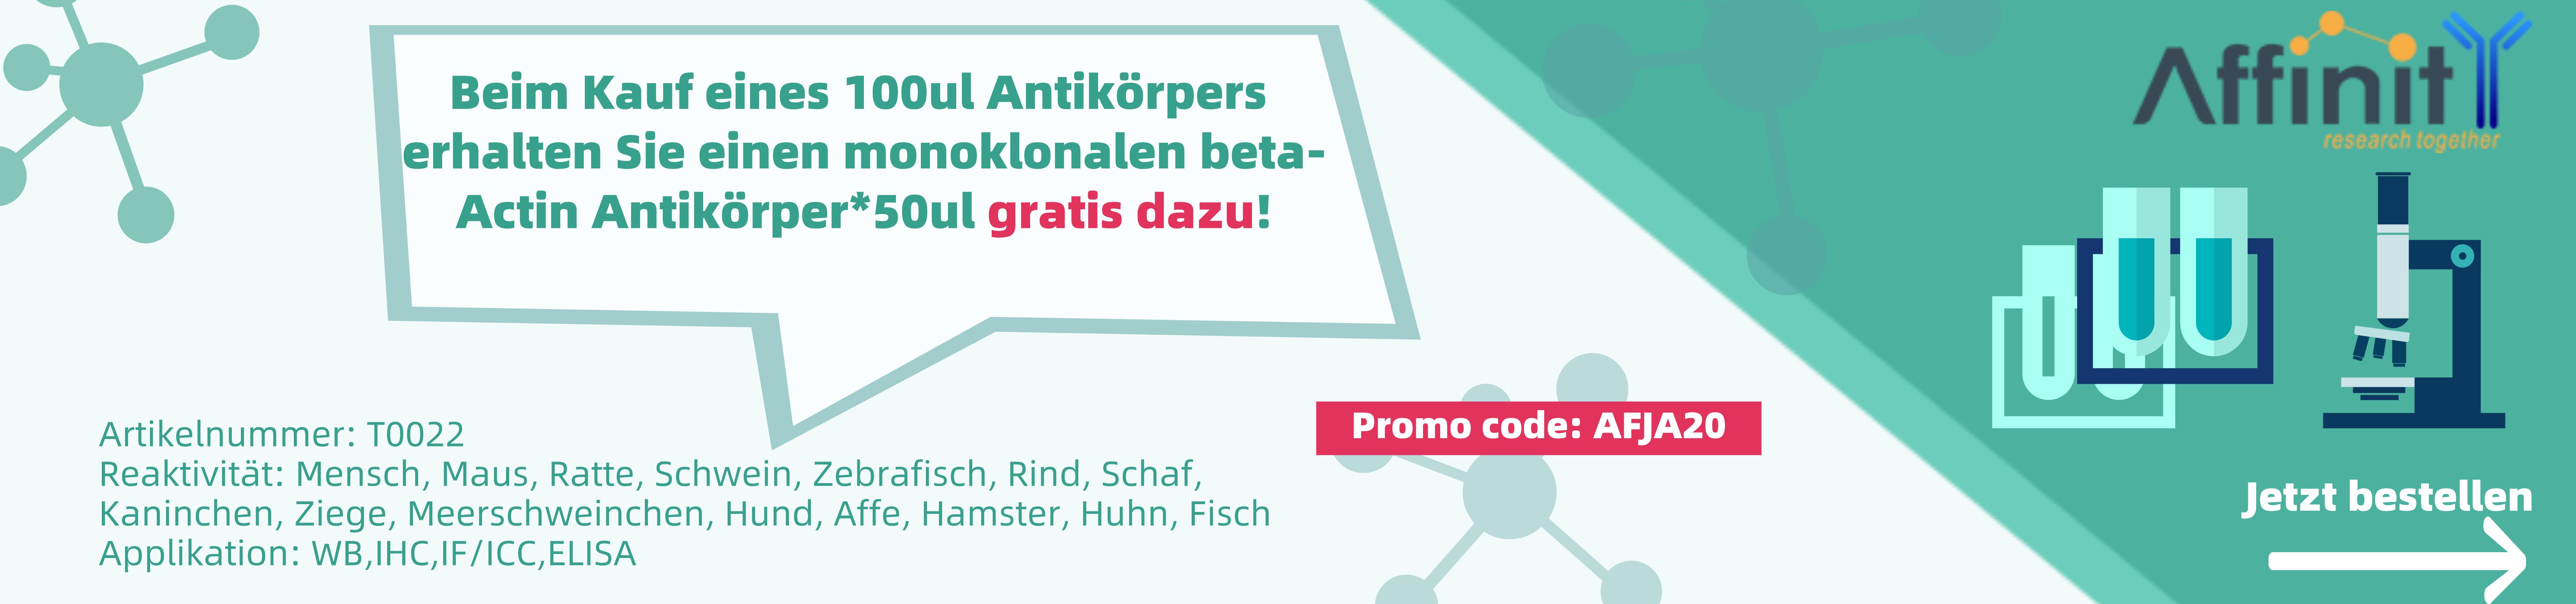 Affinity Biosciences Antikörper Promo